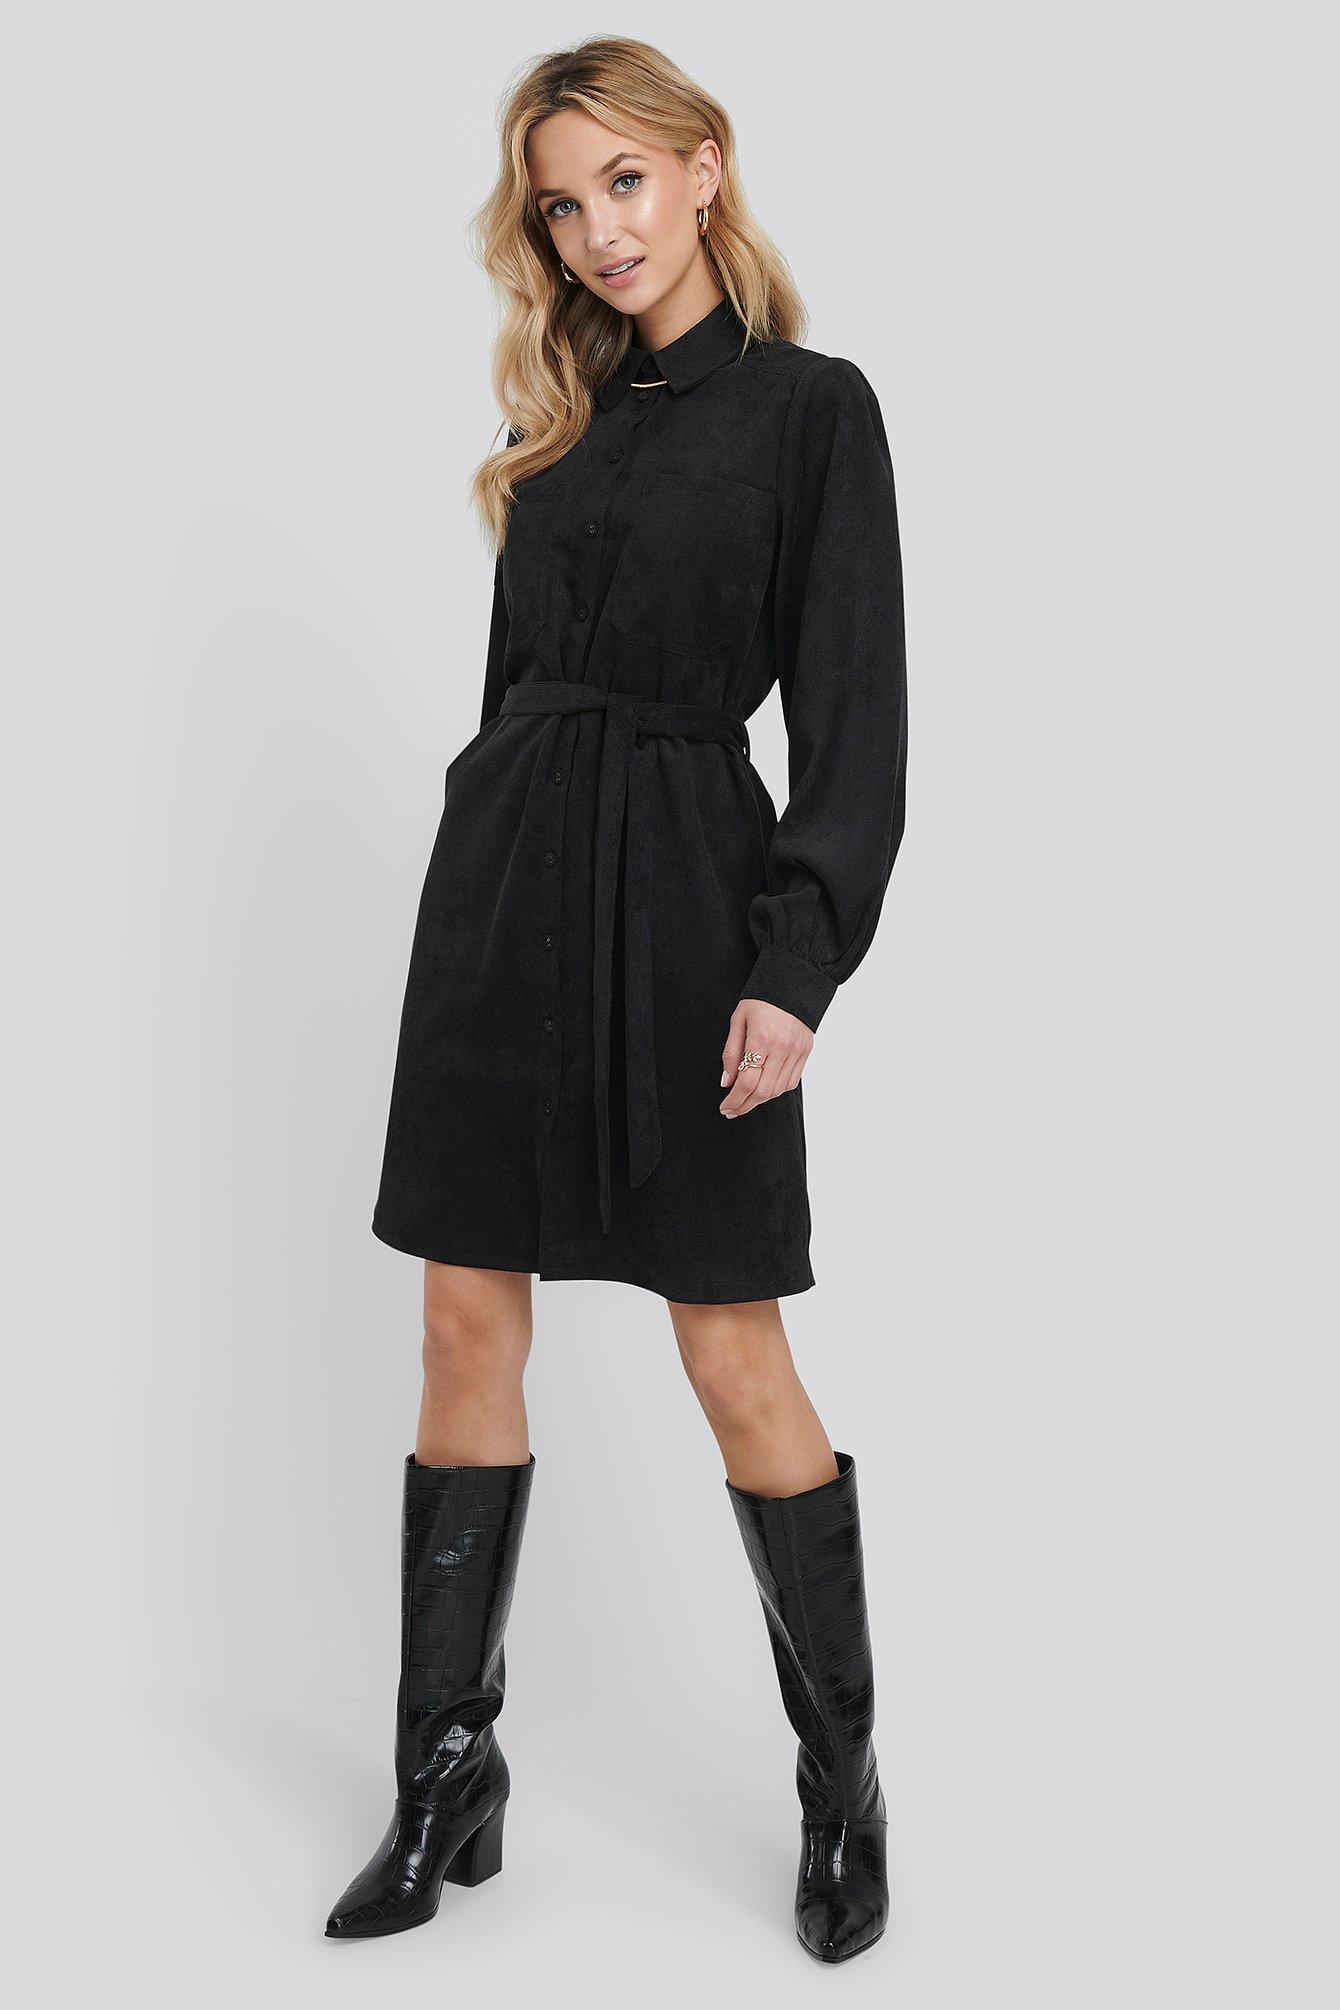 Corduroy Tied Waist Shirt Dress Black by Na Kd Trend